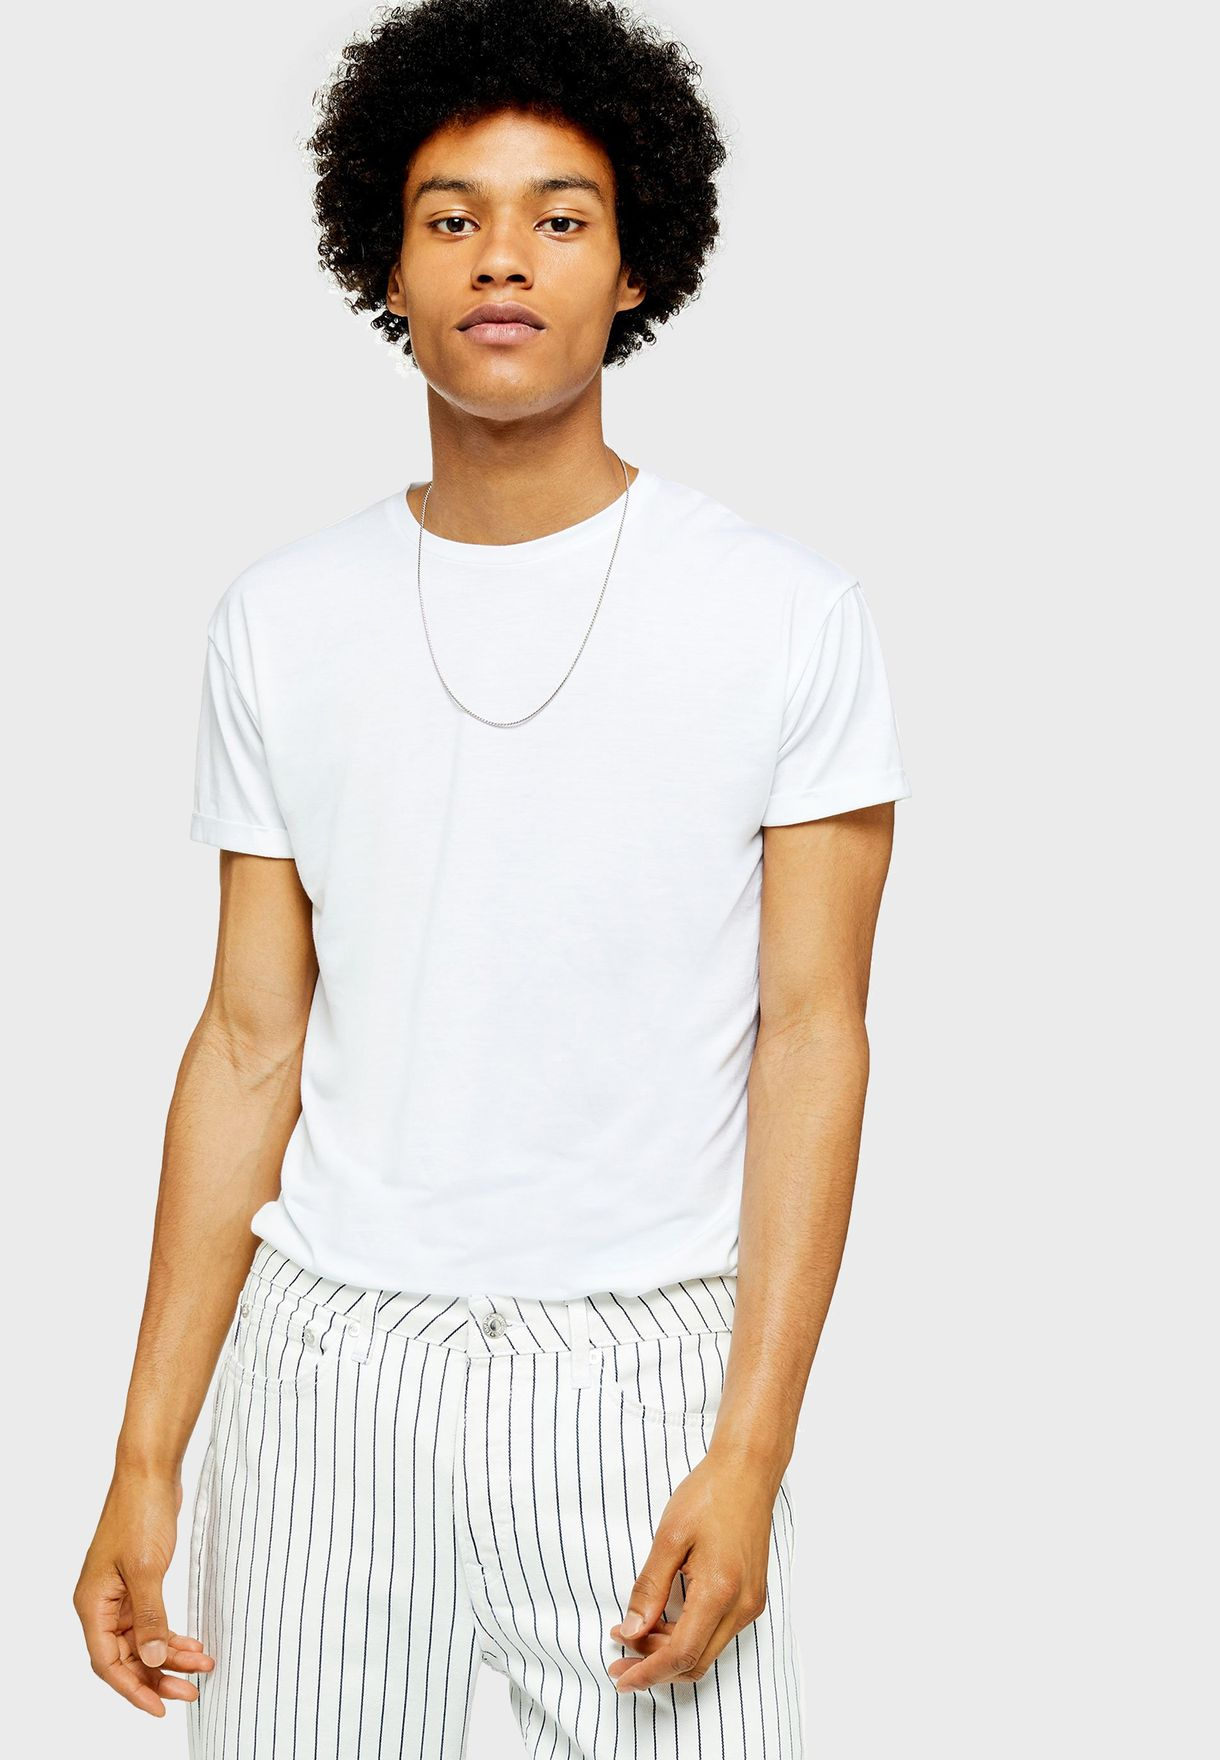 f710043f Shop Topman white Scotty Longline T-Shirt 71Q07SWHT for Men in UAE ...